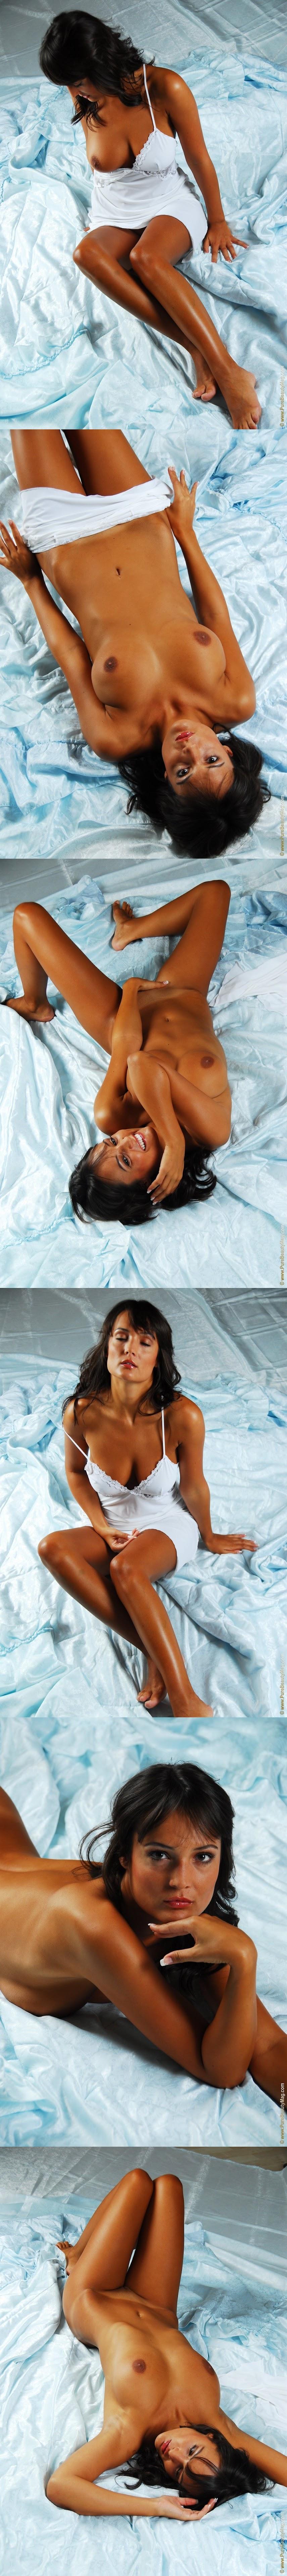 PureBeautyMag PBM  - 2006-08-29 - #s259689 - Karol P - What a Fox! - 3872px - idols